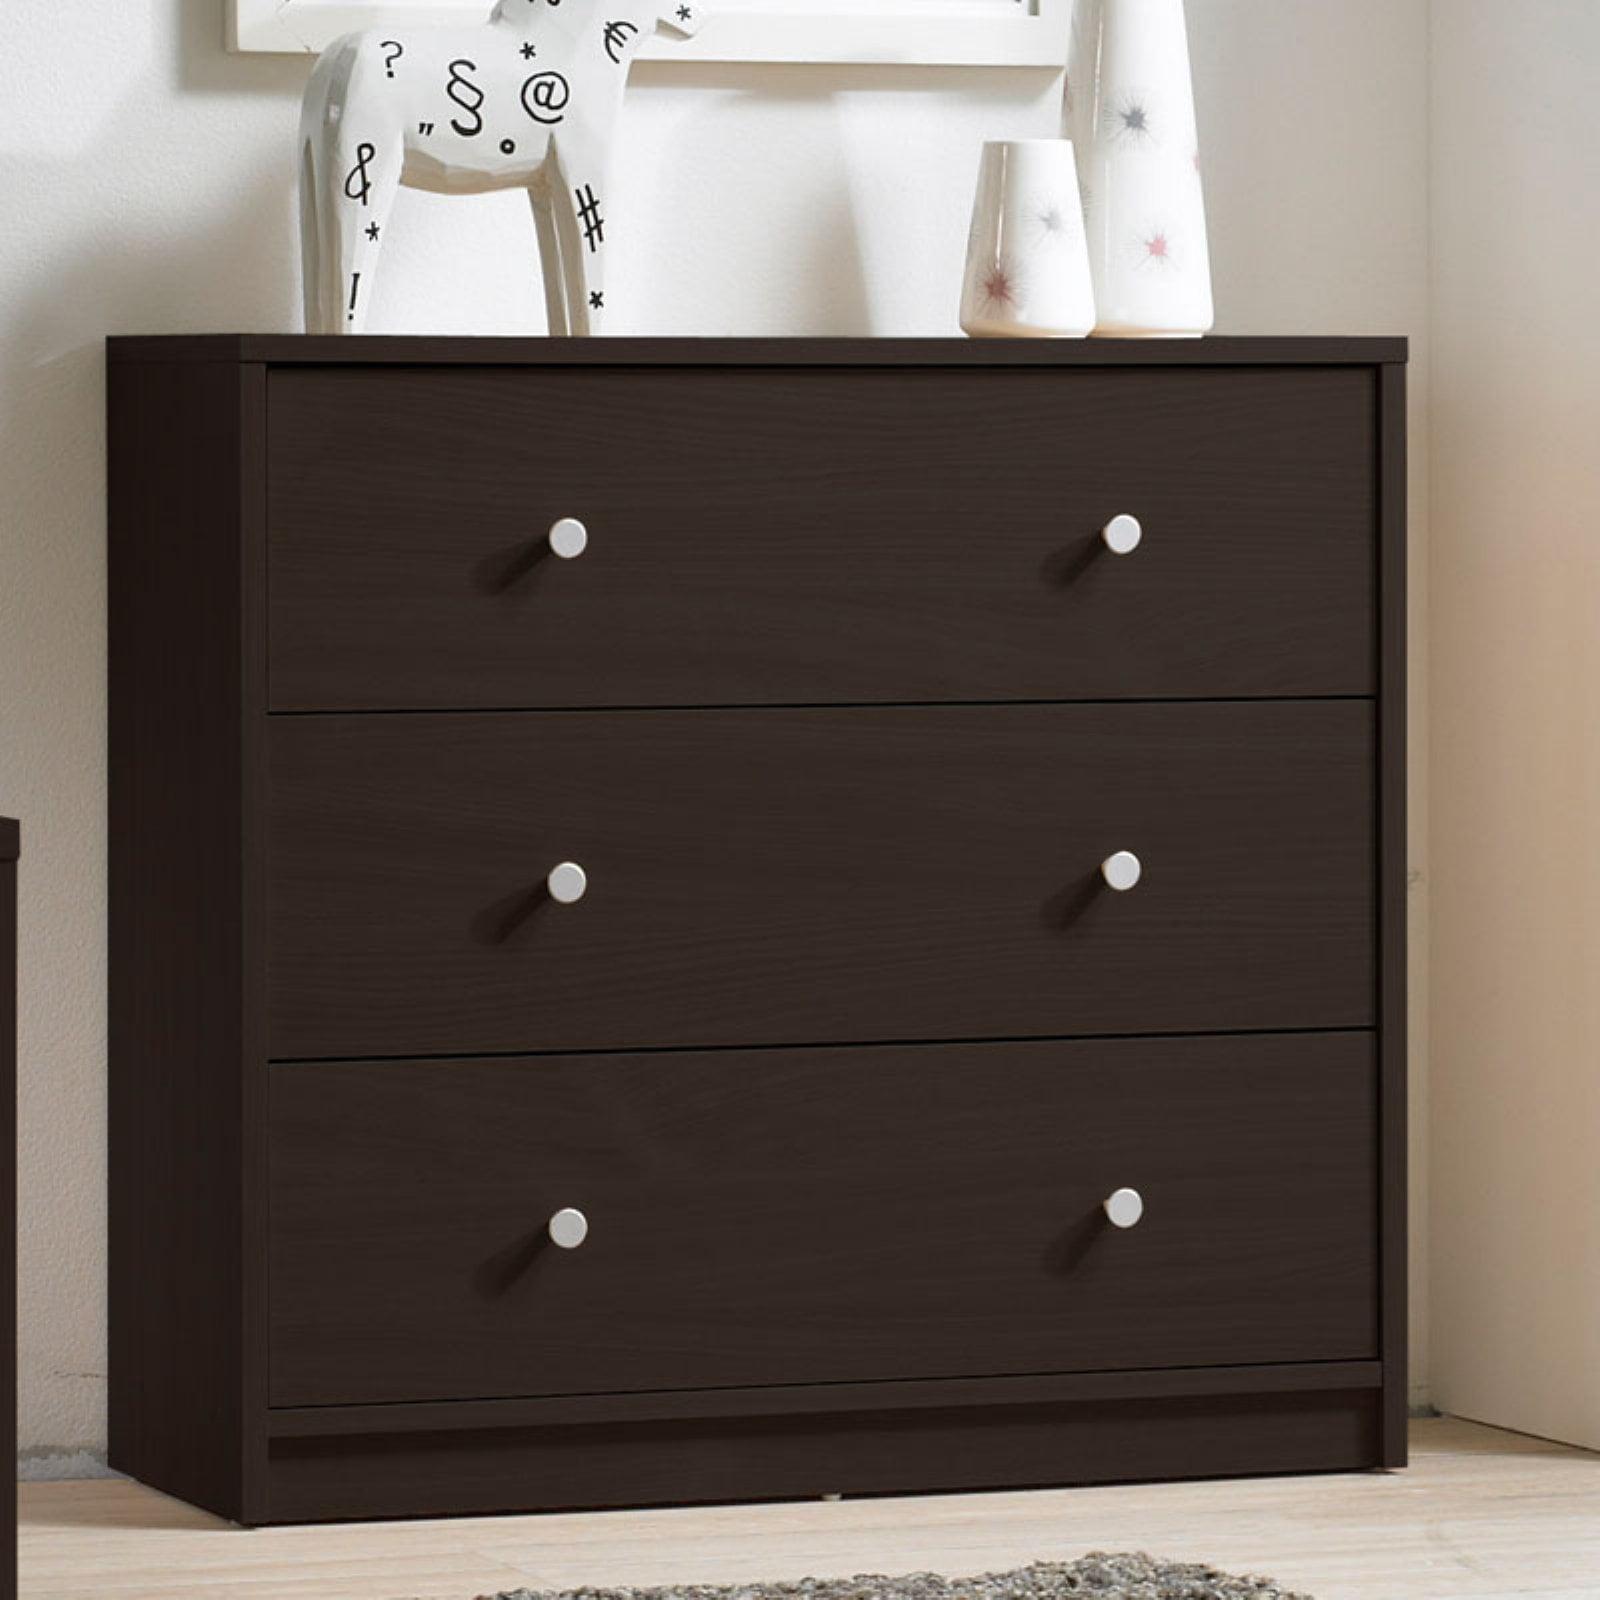 product hayneedle chest espresso cfm master dresser fremont prepac drawer cheap